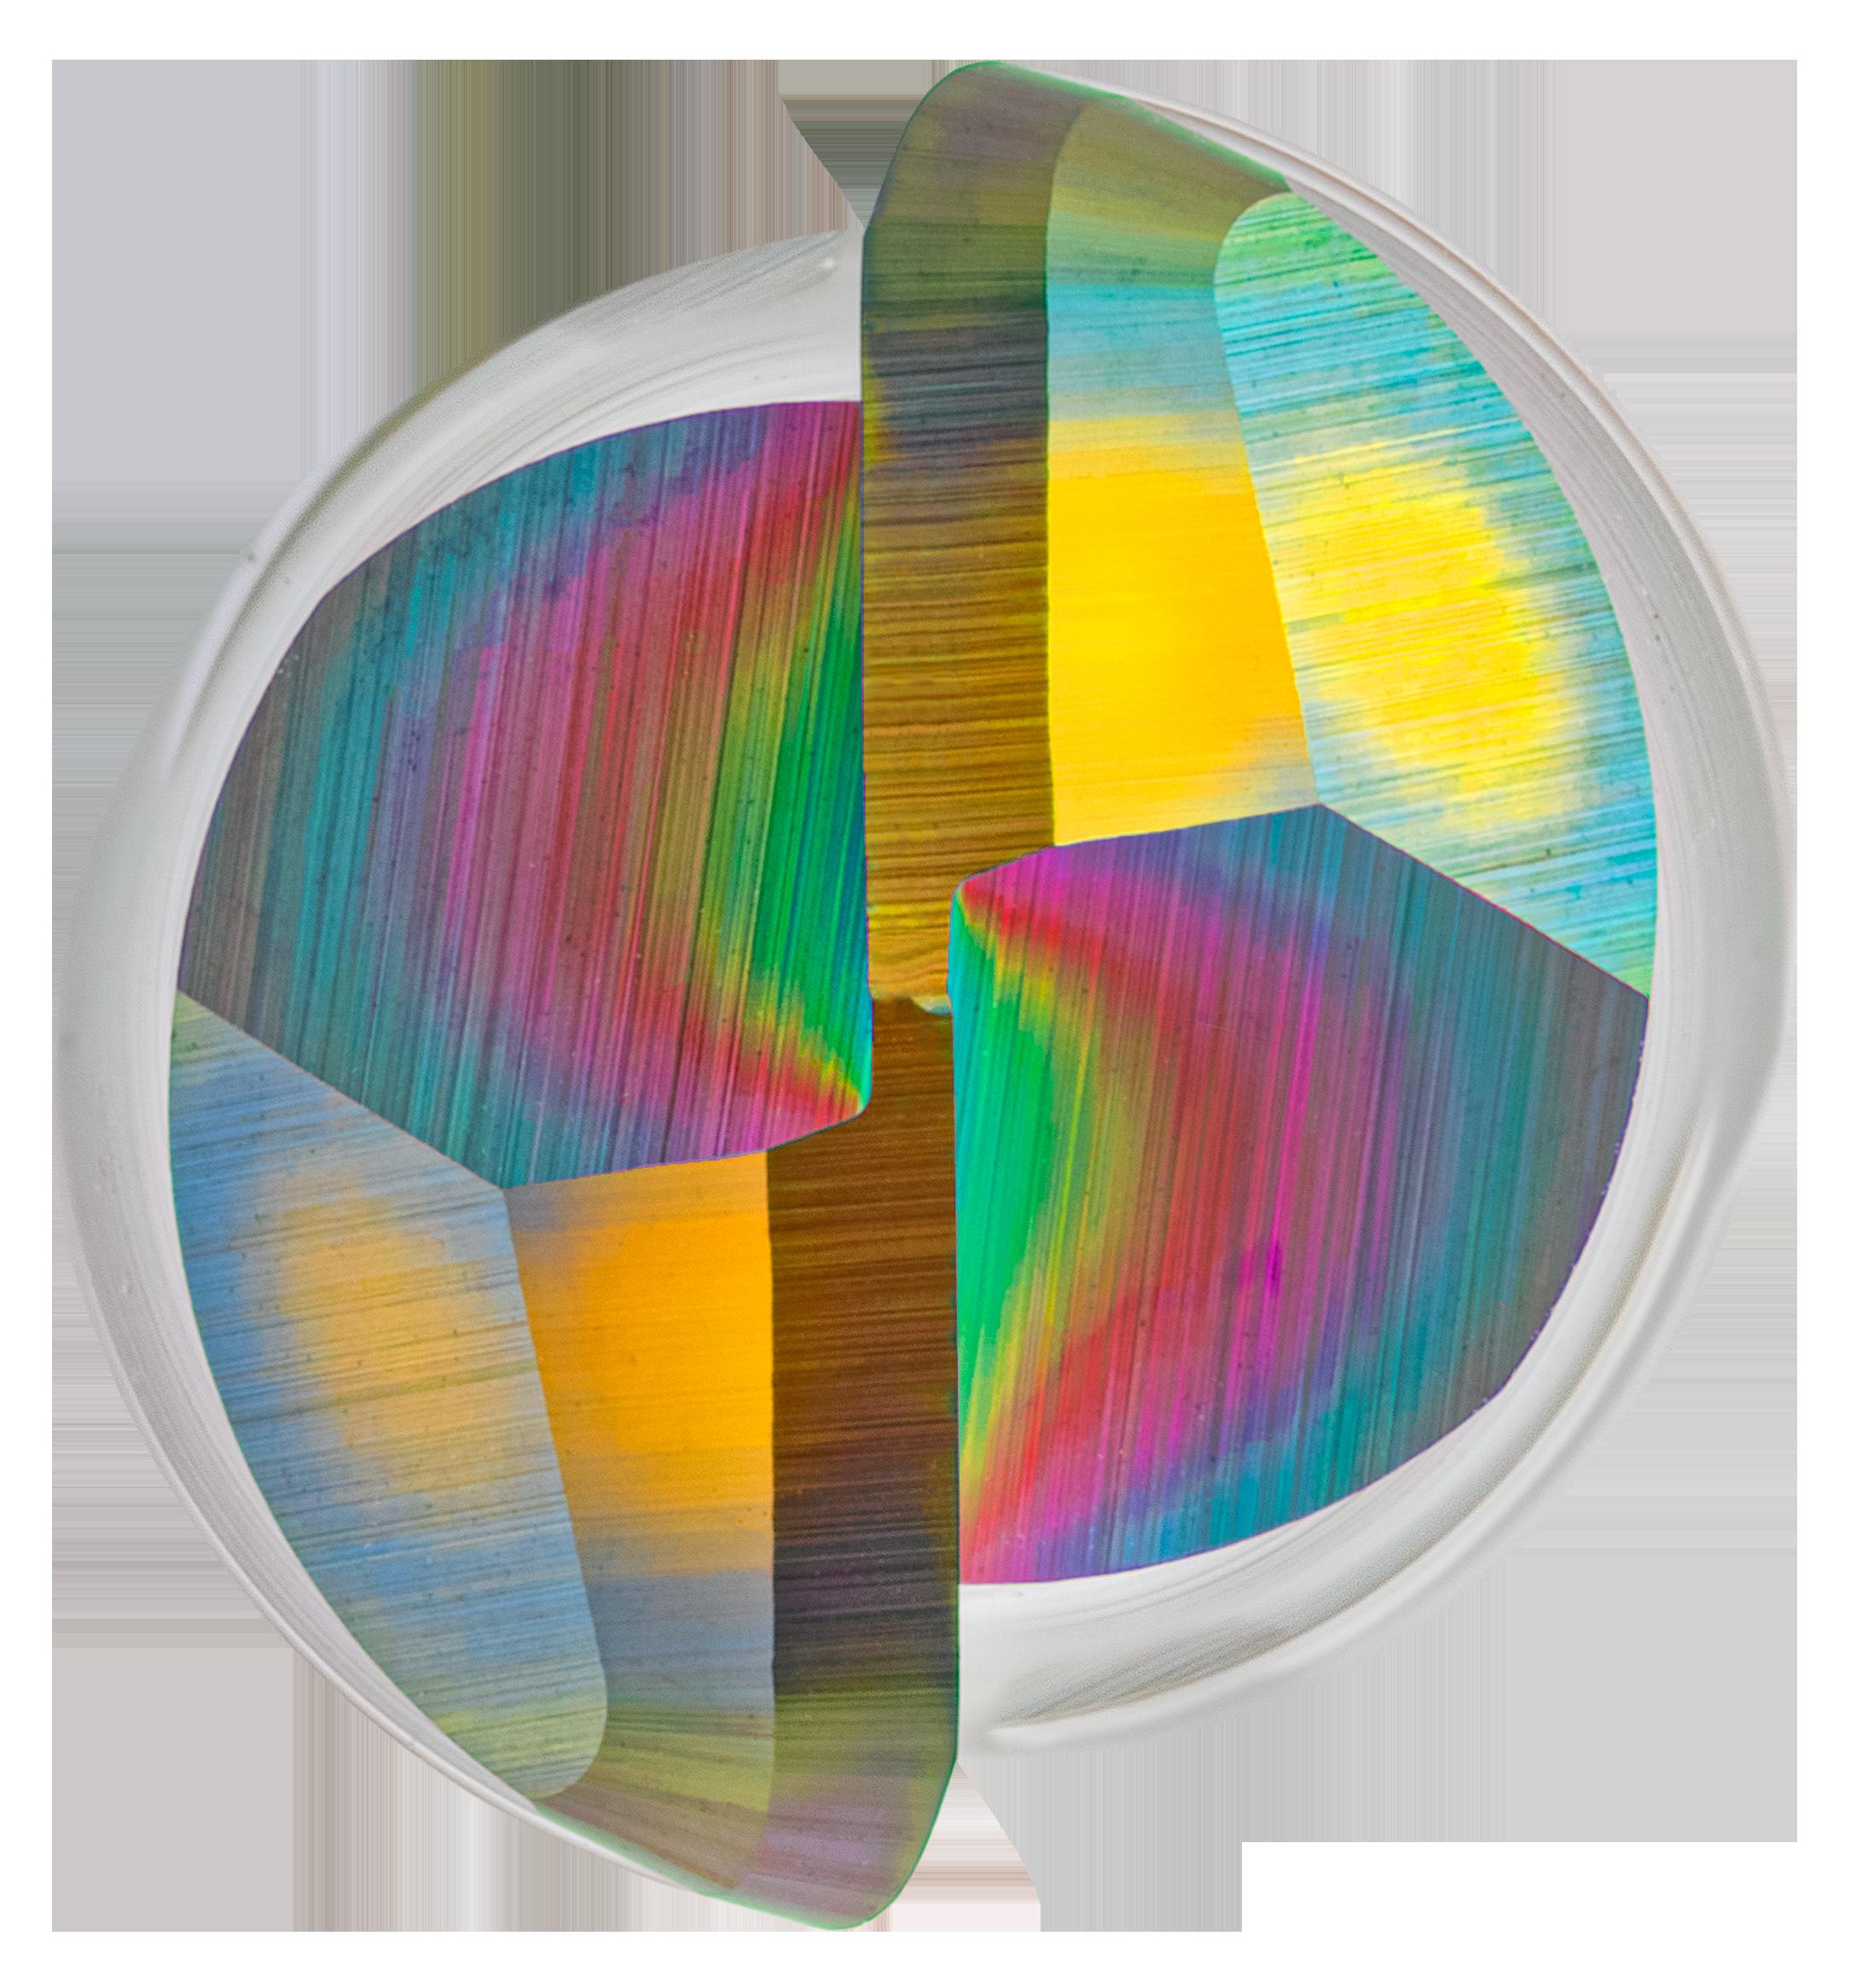 EXN1-M16-0183